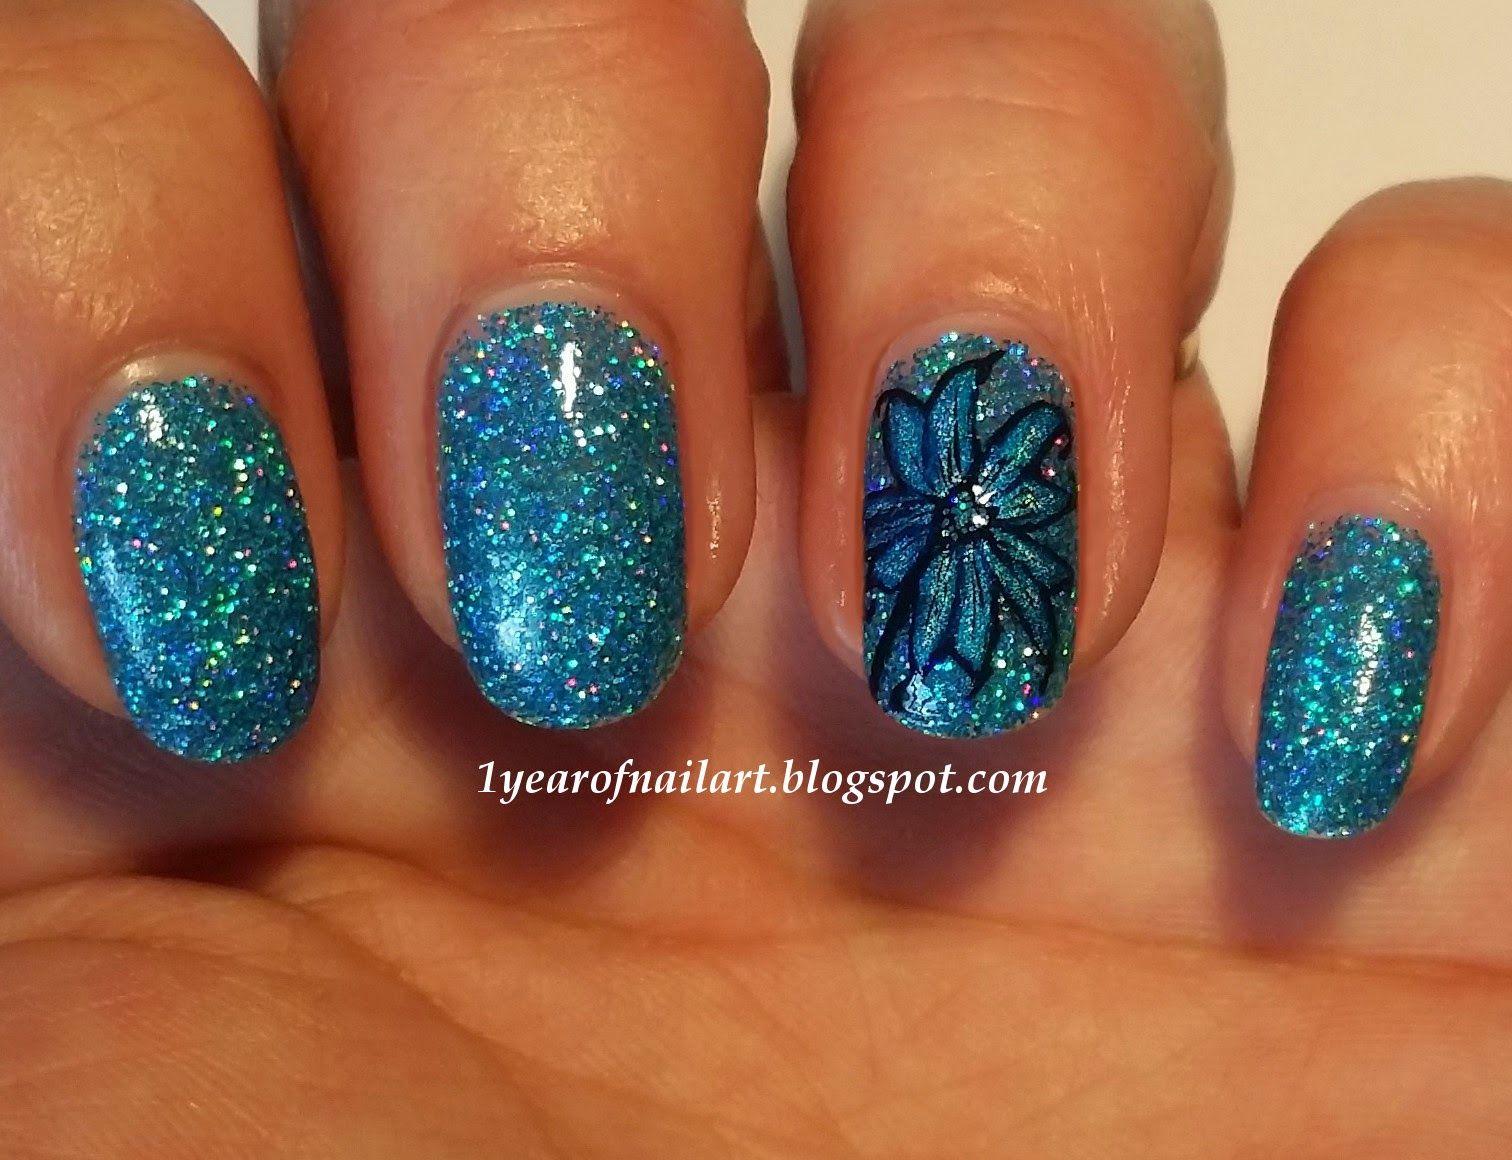 365 Days Of Nail Art Blue Holo Flower Nail Art Nail Arts Around